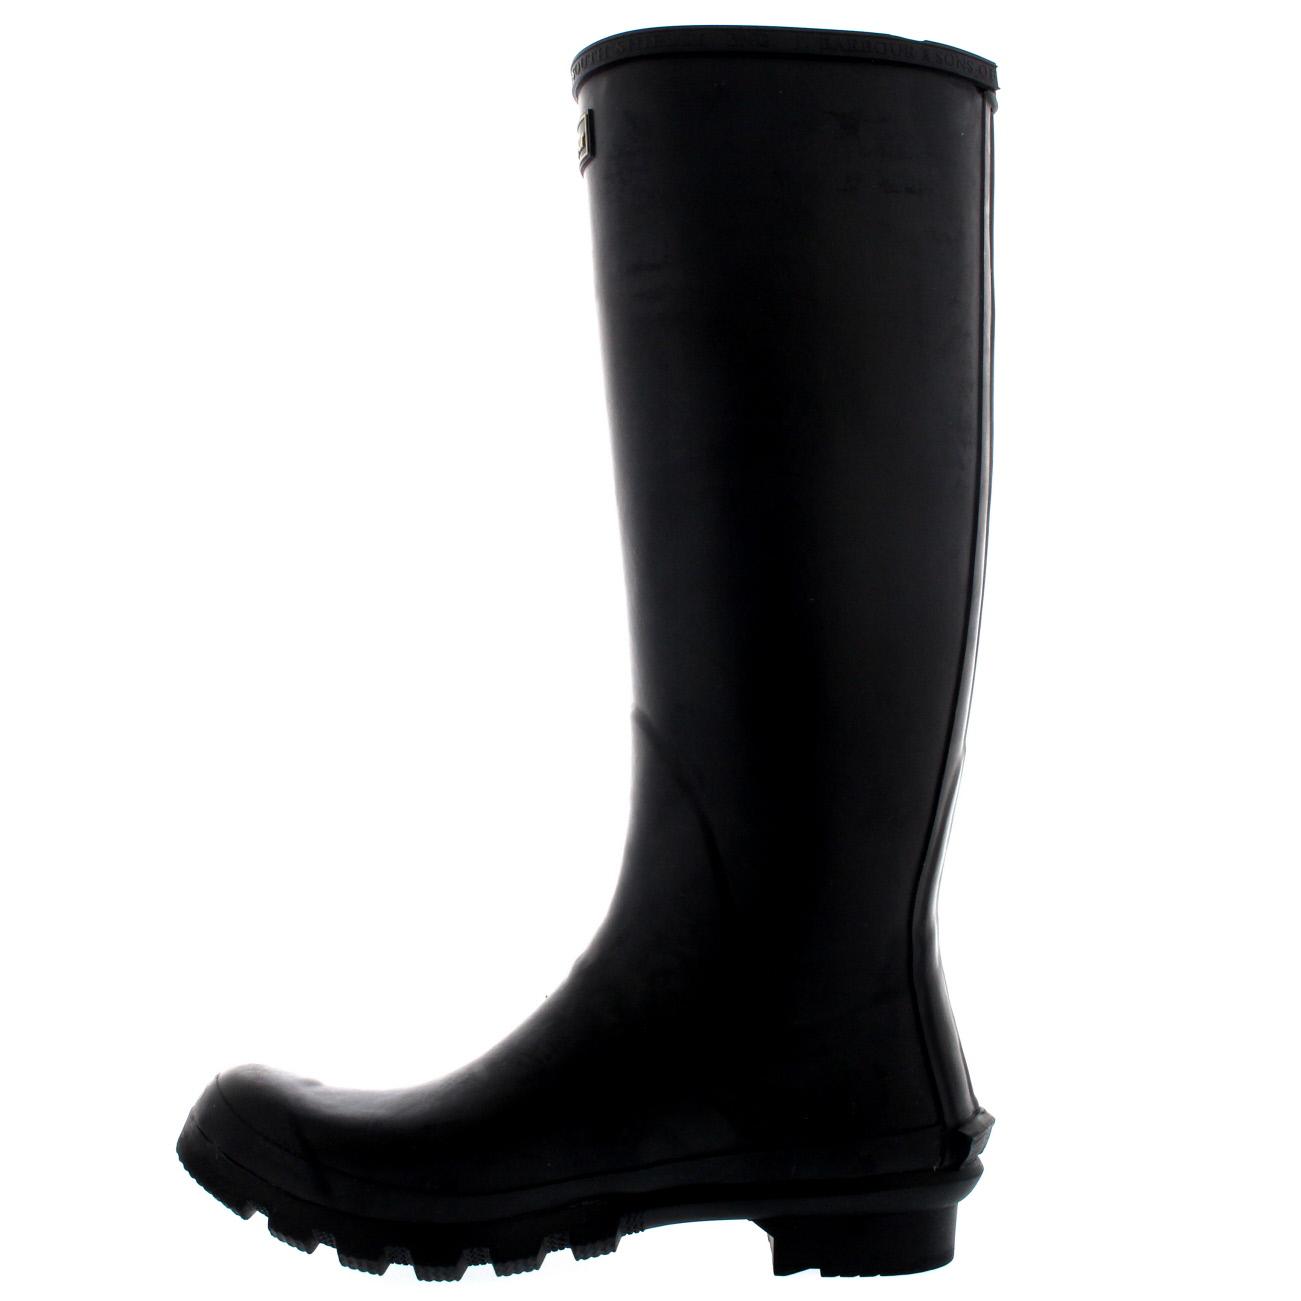 Womens-Barbour-Bede-Snow-Waterproof-Winter-Wellingtons-Mid-Calf-Boots-US-5-11 thumbnail 11